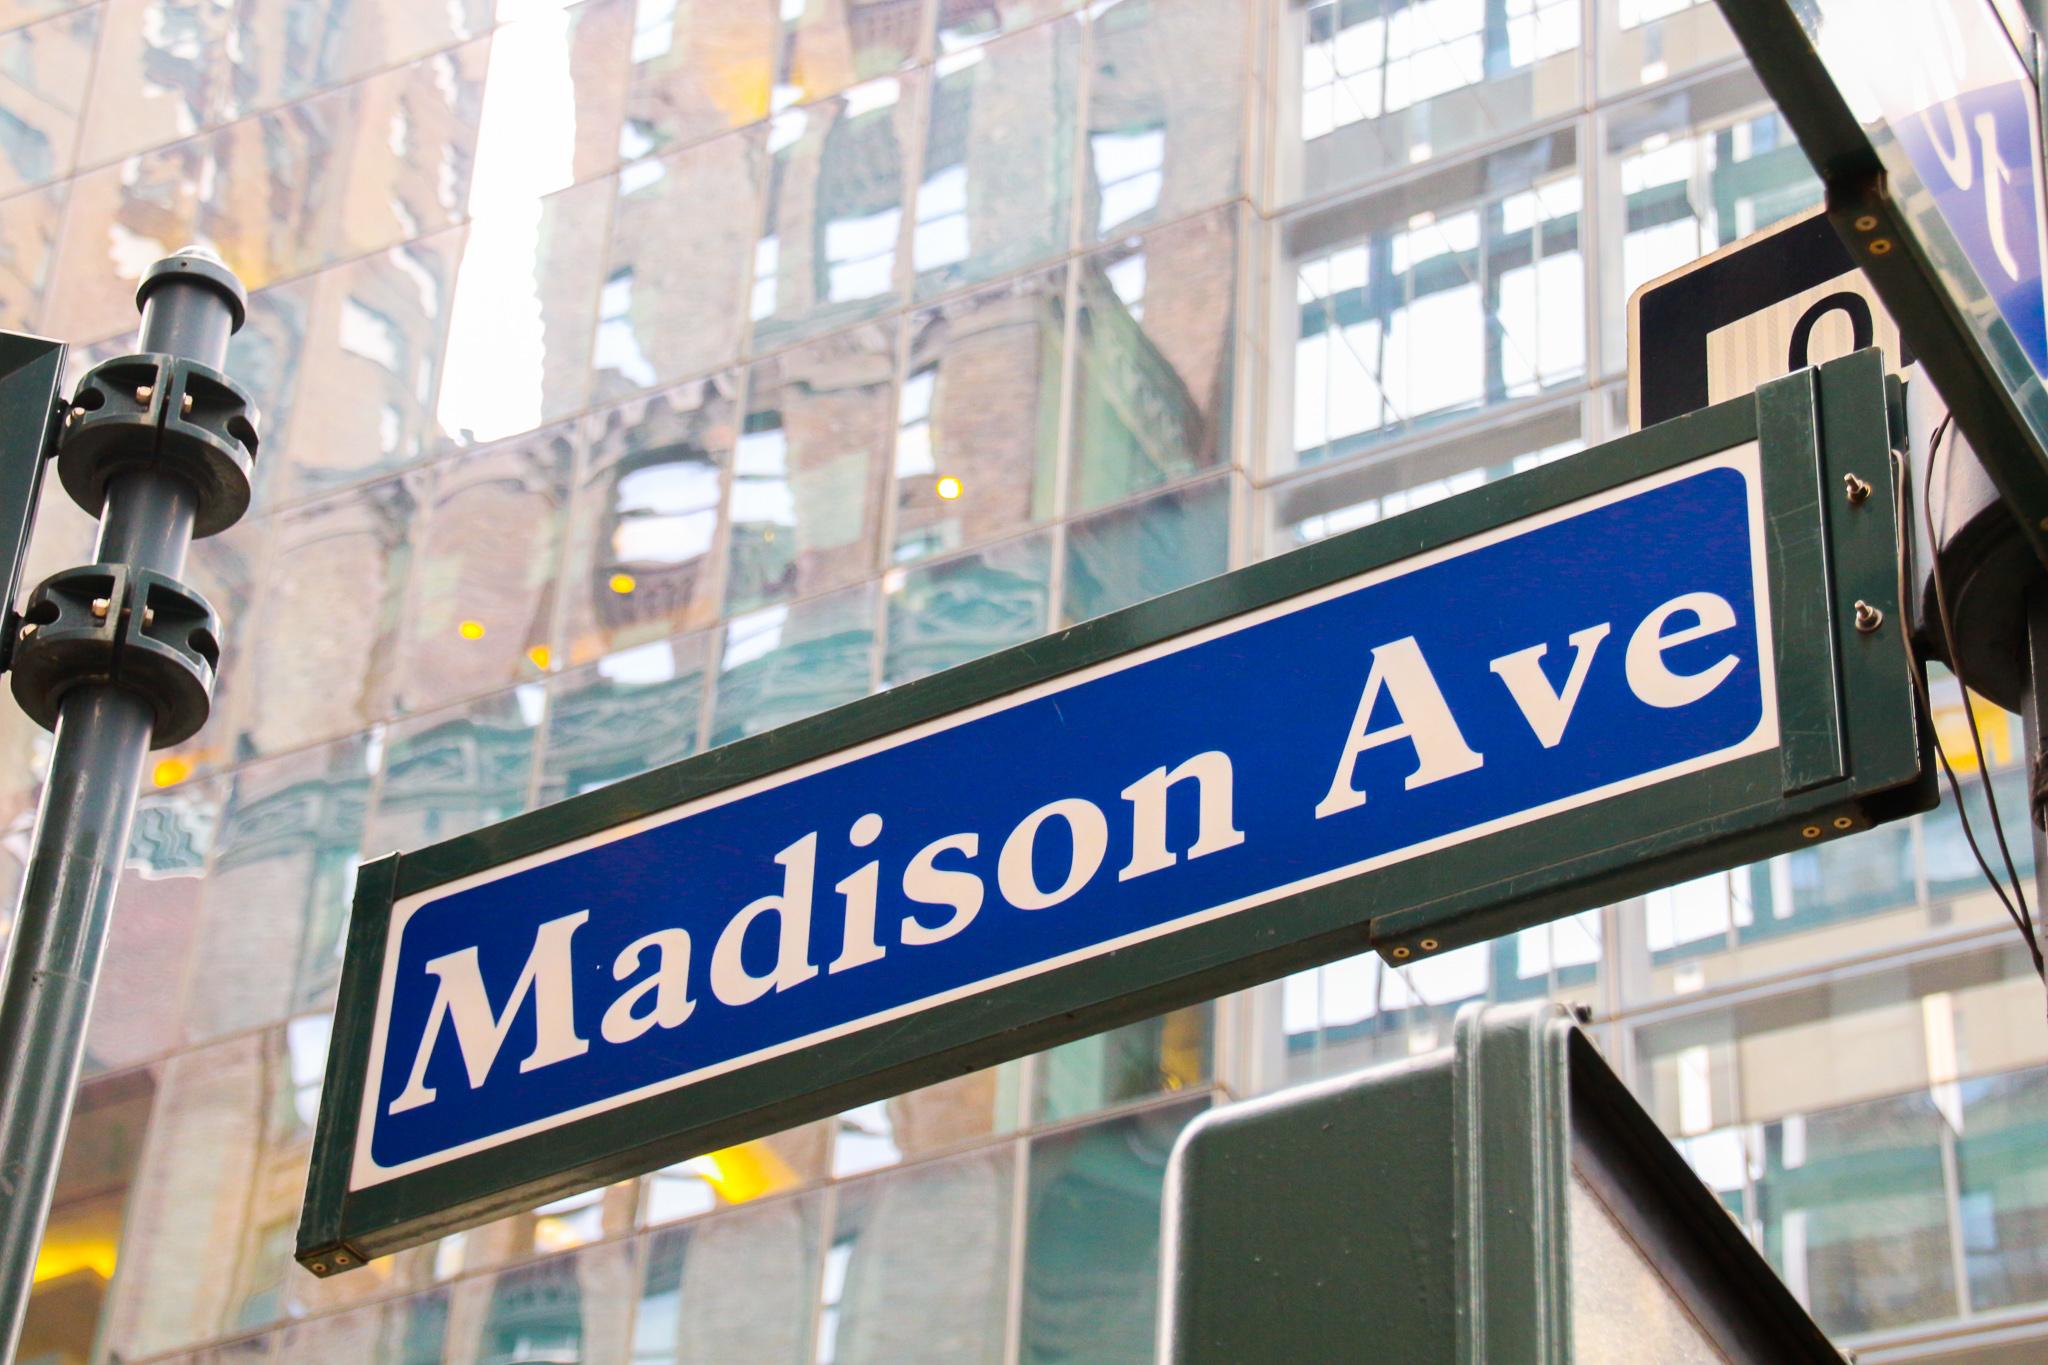 Madison AV.